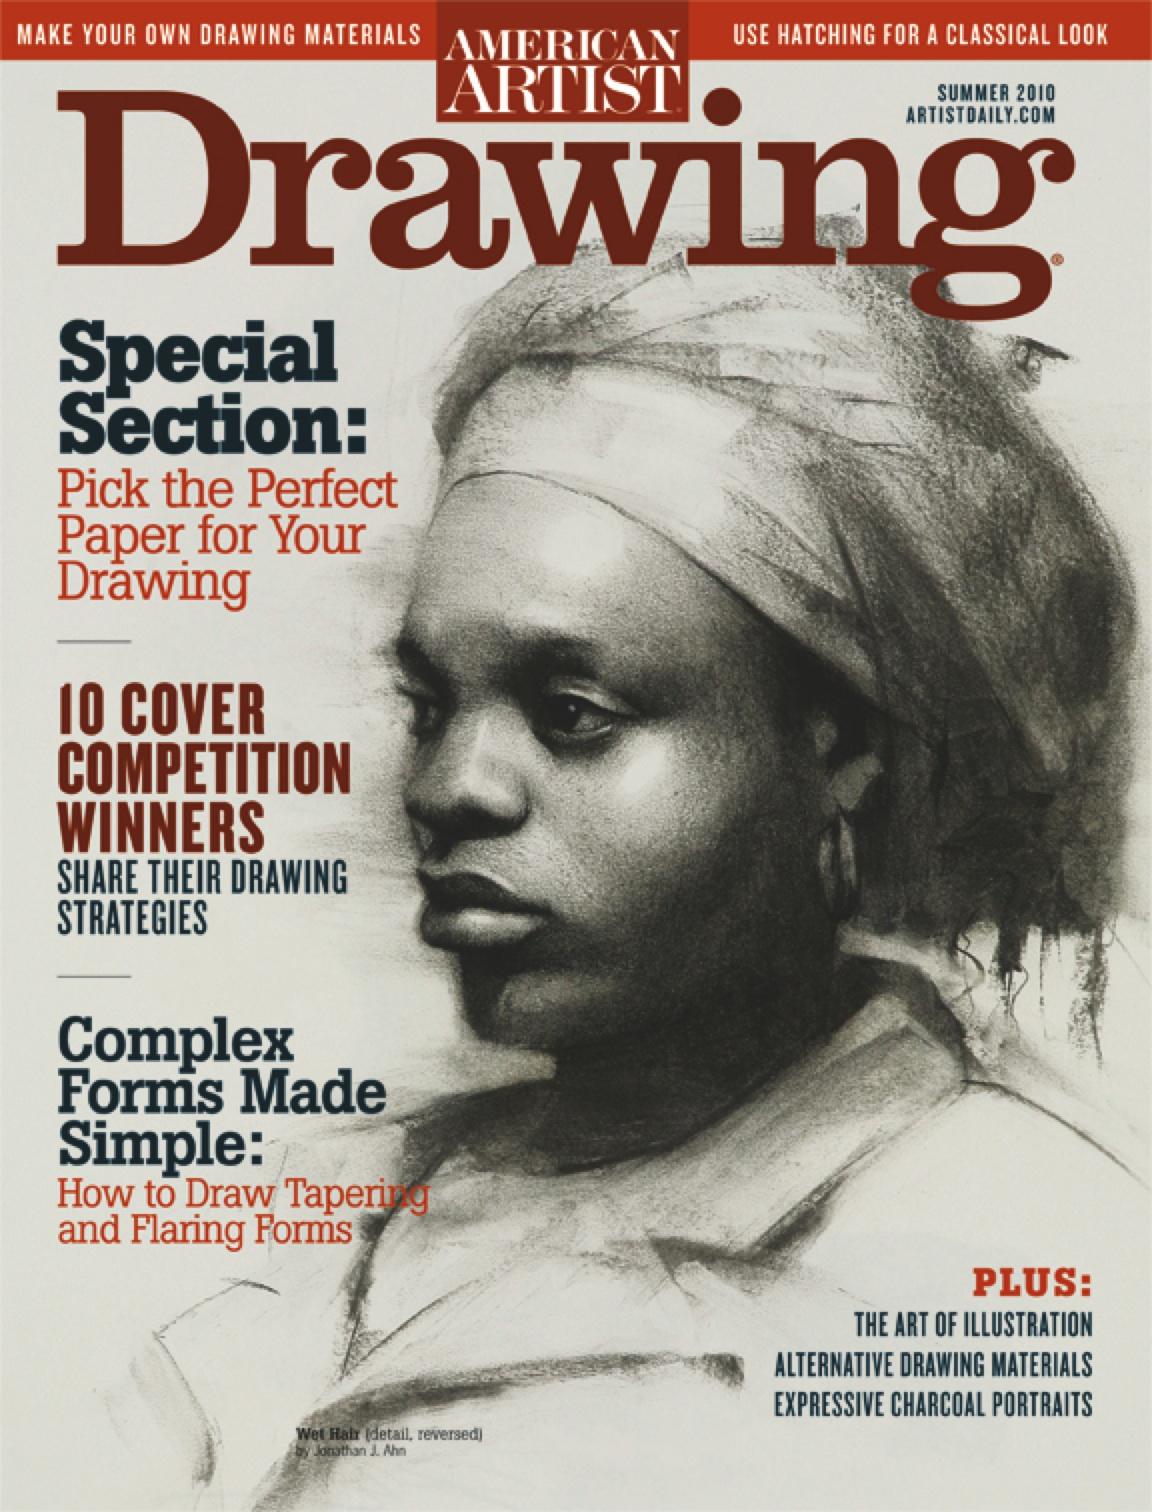 1152x1512 American Artist Drawing Magazine American Artist Drawing Magazine